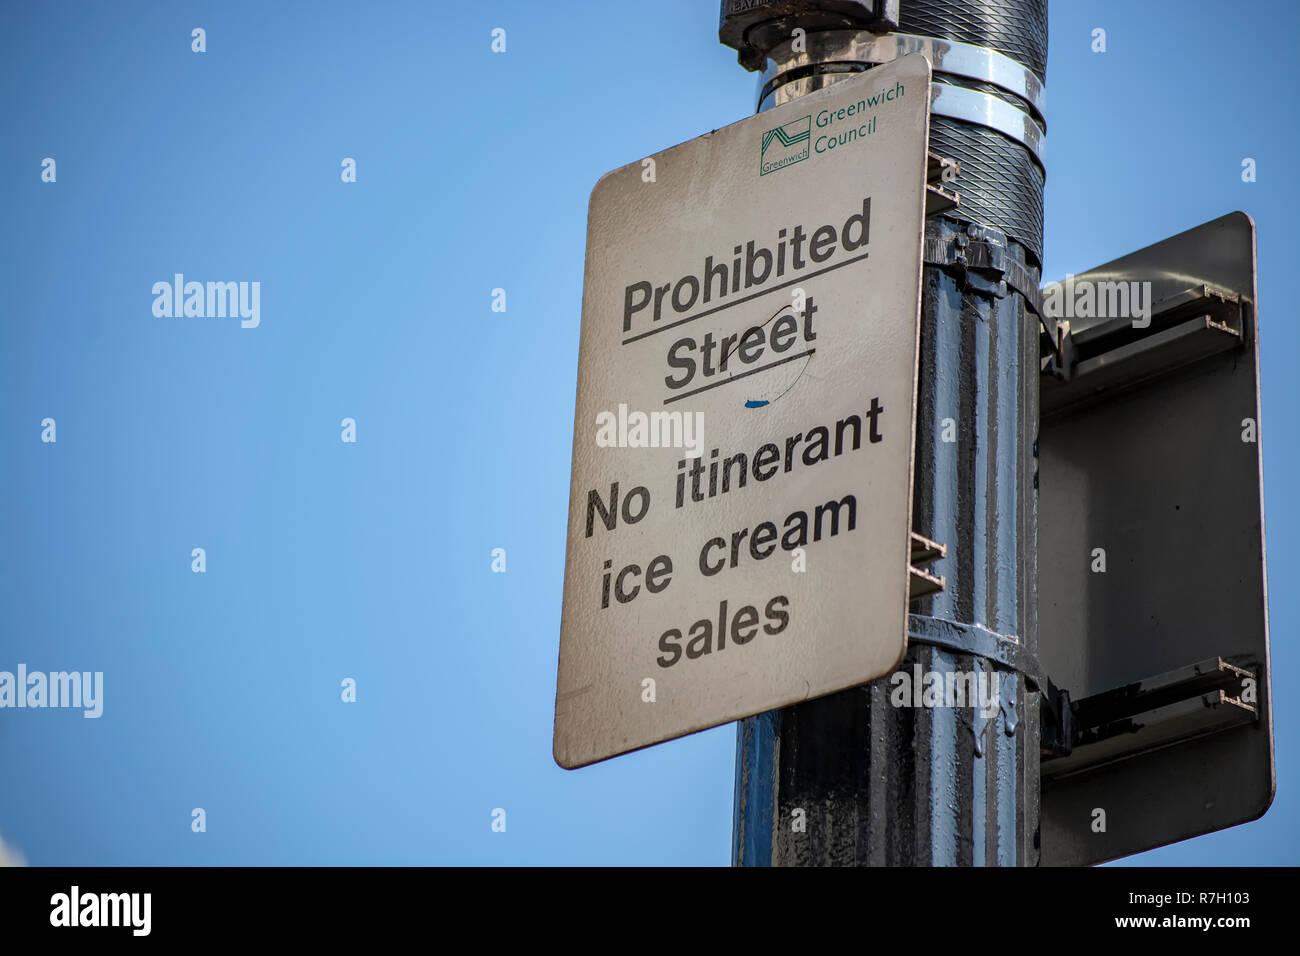 Prohibited Ice Cream Vendor Sign - Stock Image